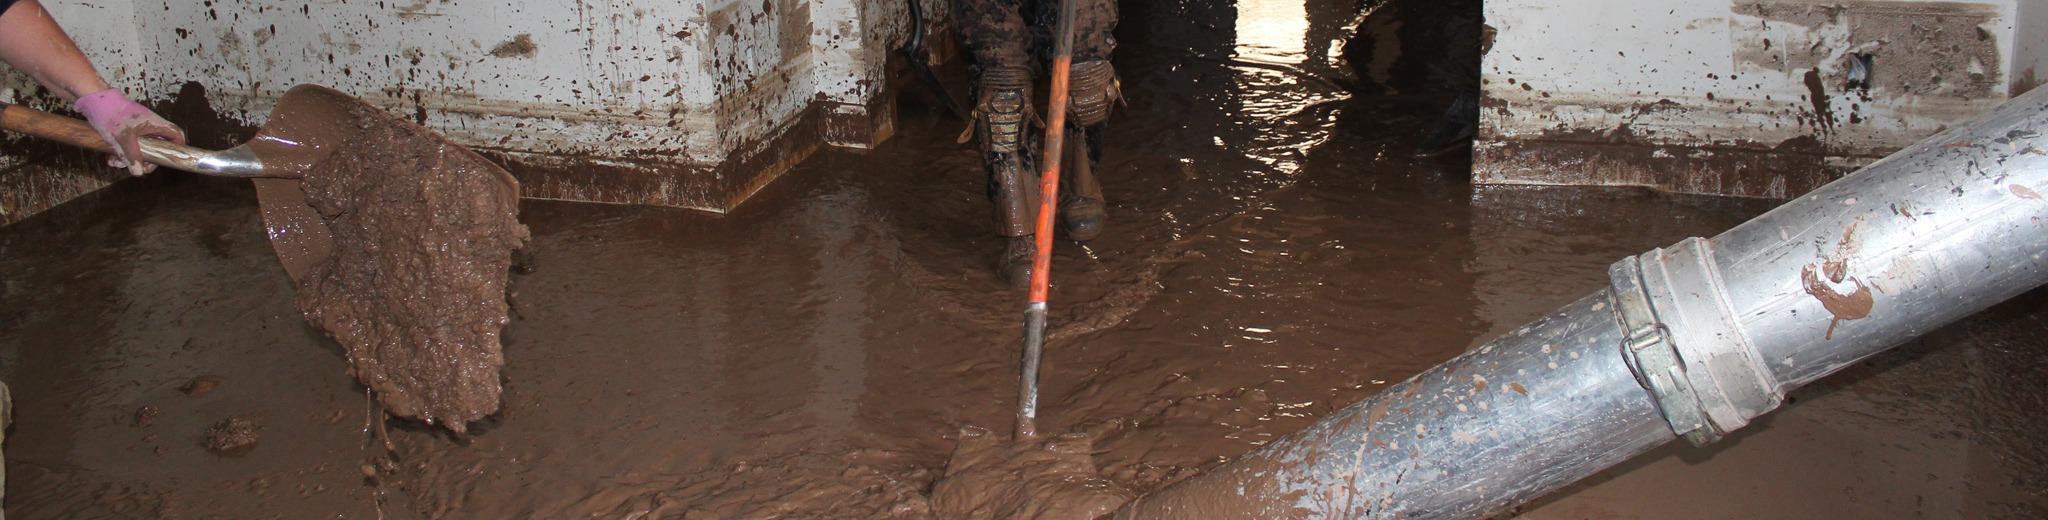 disaster recovery in cincinnati oh brock restoration brock